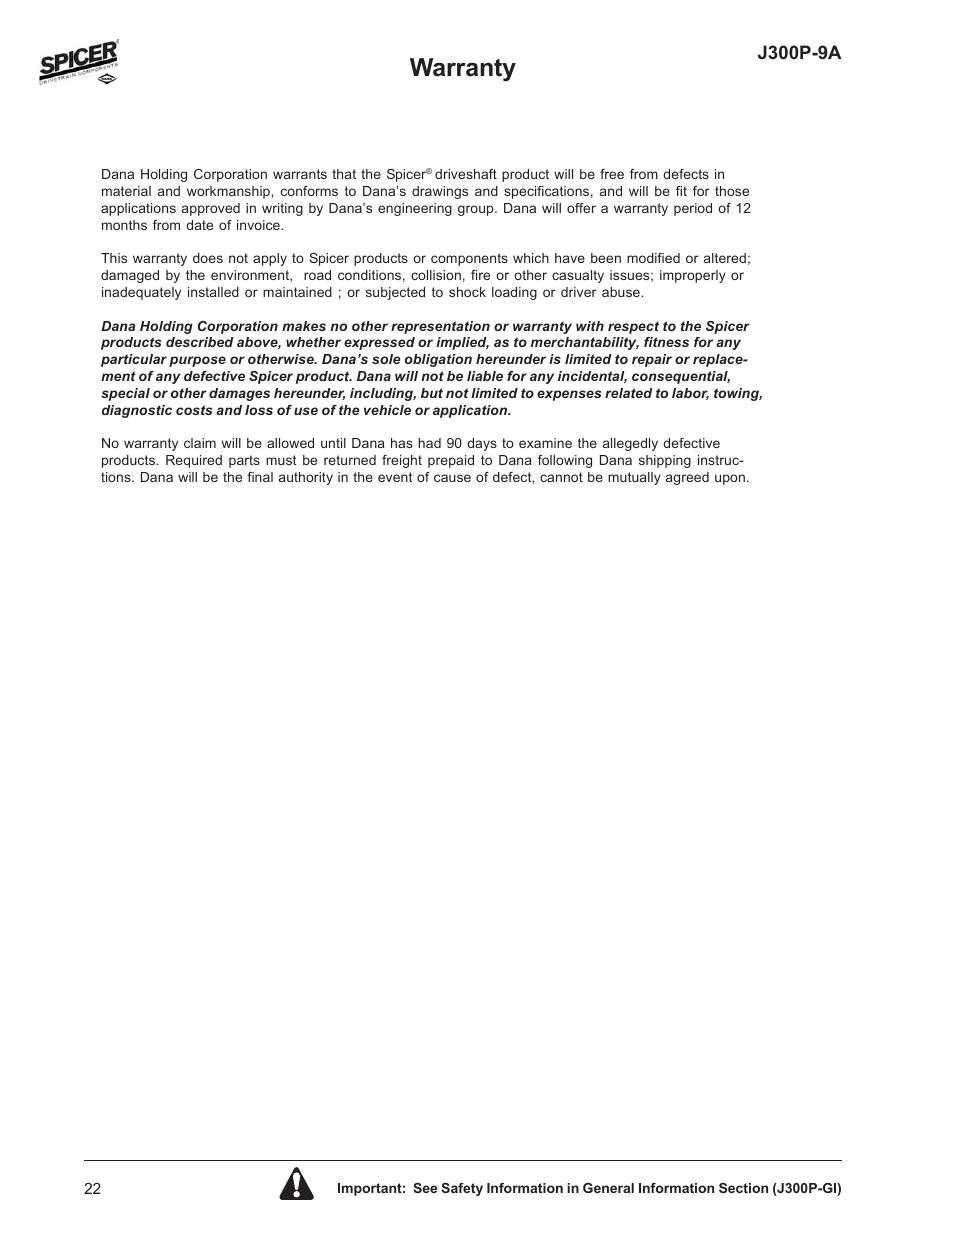 Warranty | Spicer Driveline Components Catalog: Center Bearings User